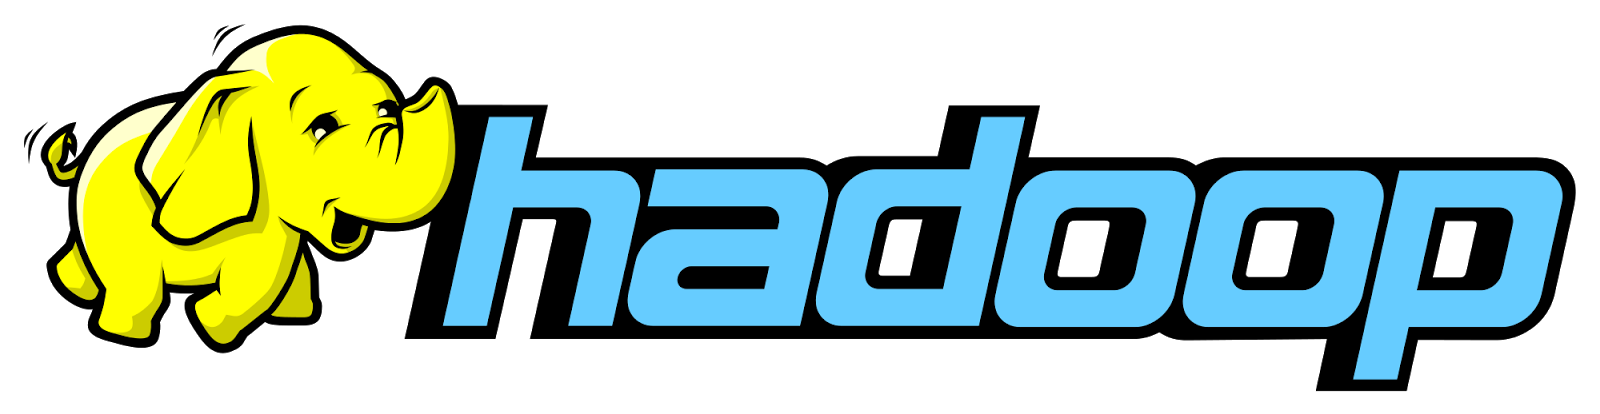 AnalyticsOnBigdata: HDFS(Hadoop Disribute File System) Block Size